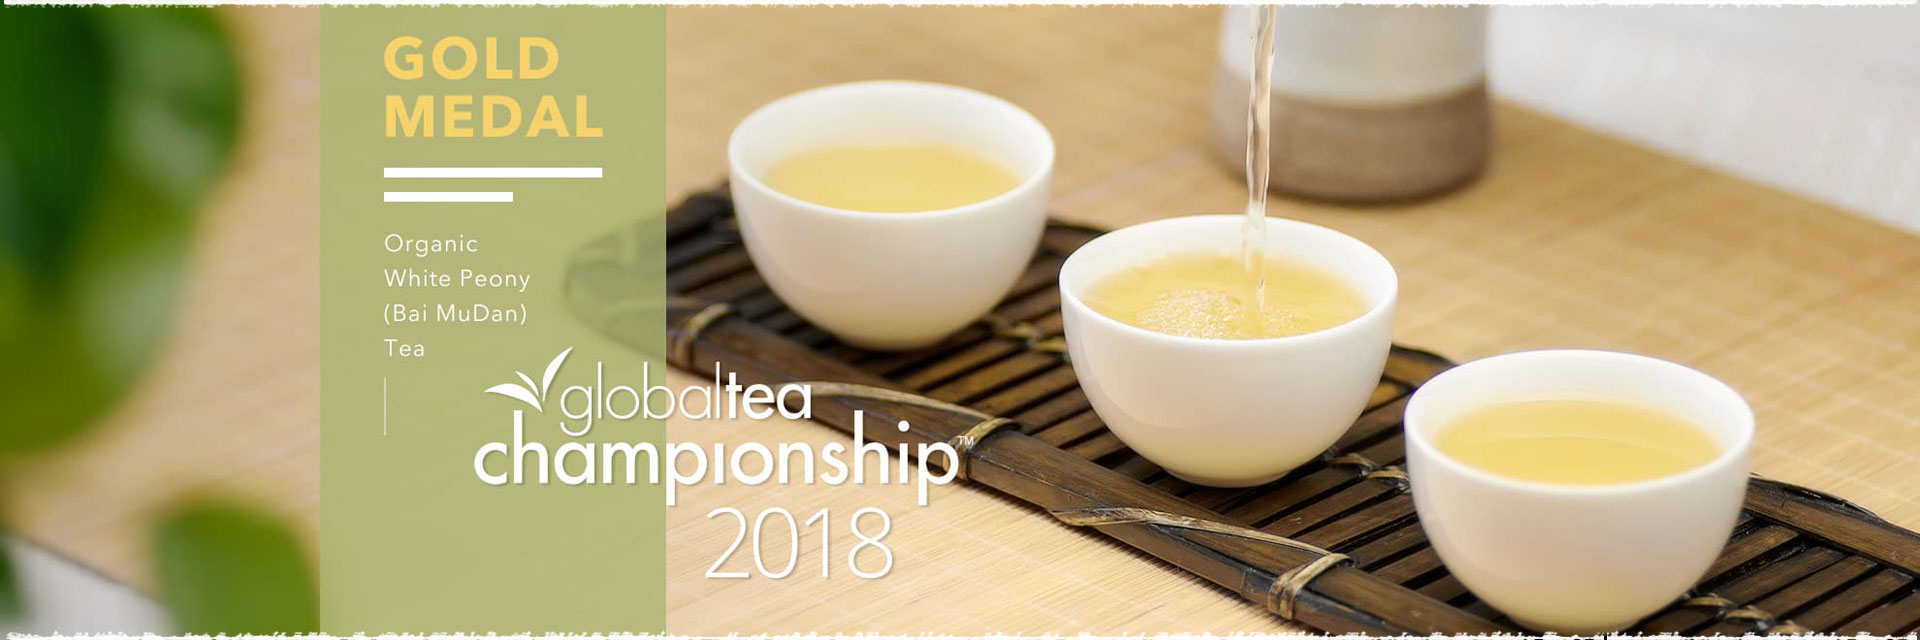 Gold Medal Organic White Peony (Bai MuDan) Tea